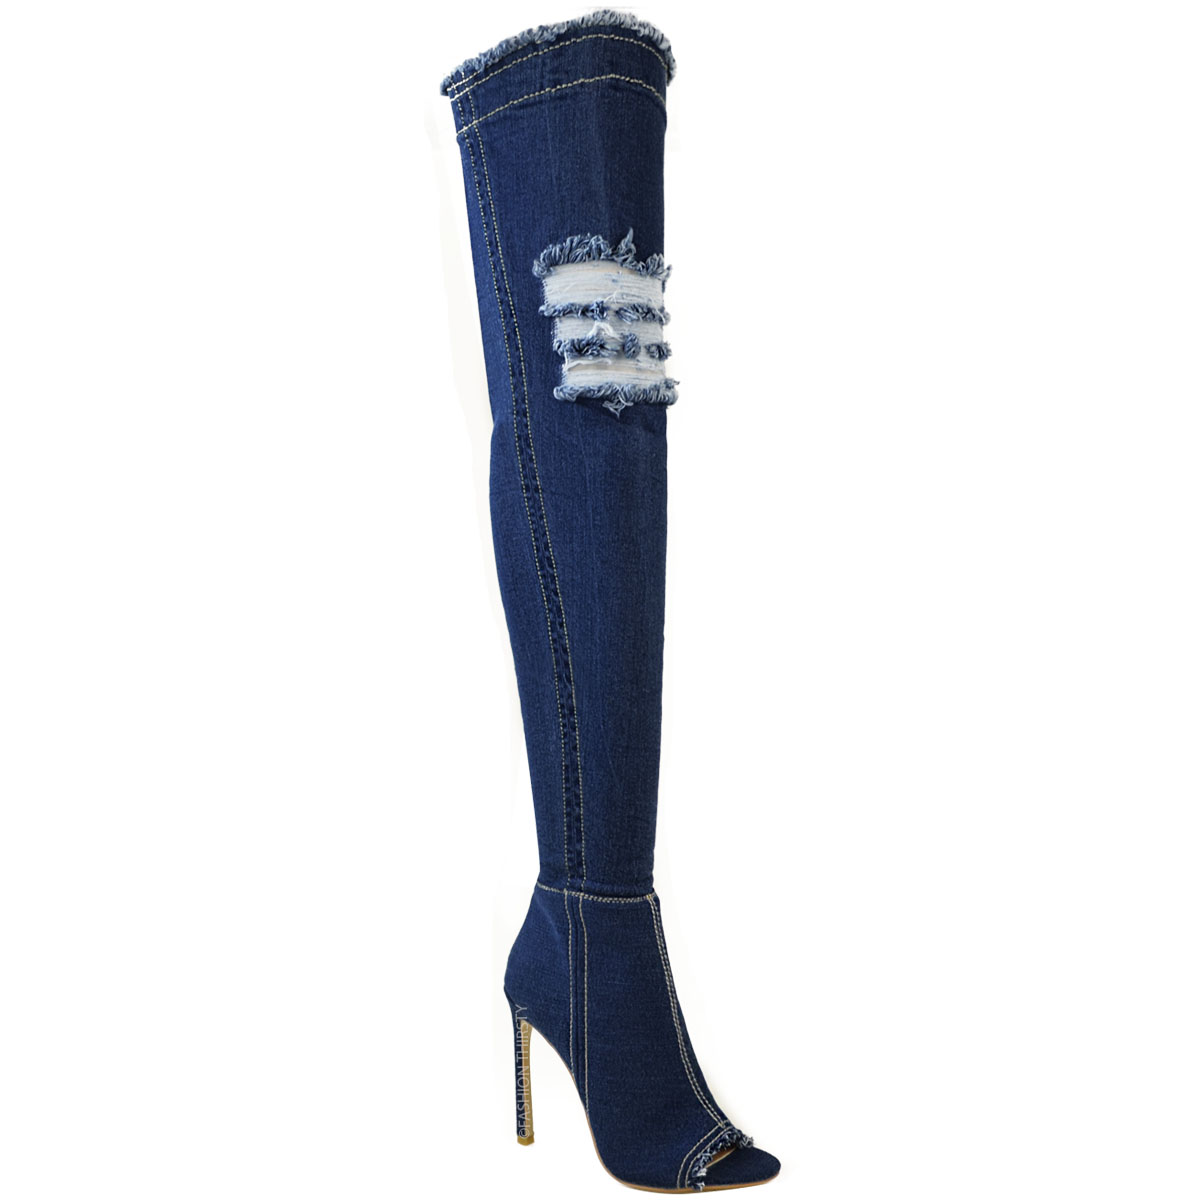 Womens Over The Knee Boots Thigh High Heels Stilettos Stretch Denim Size